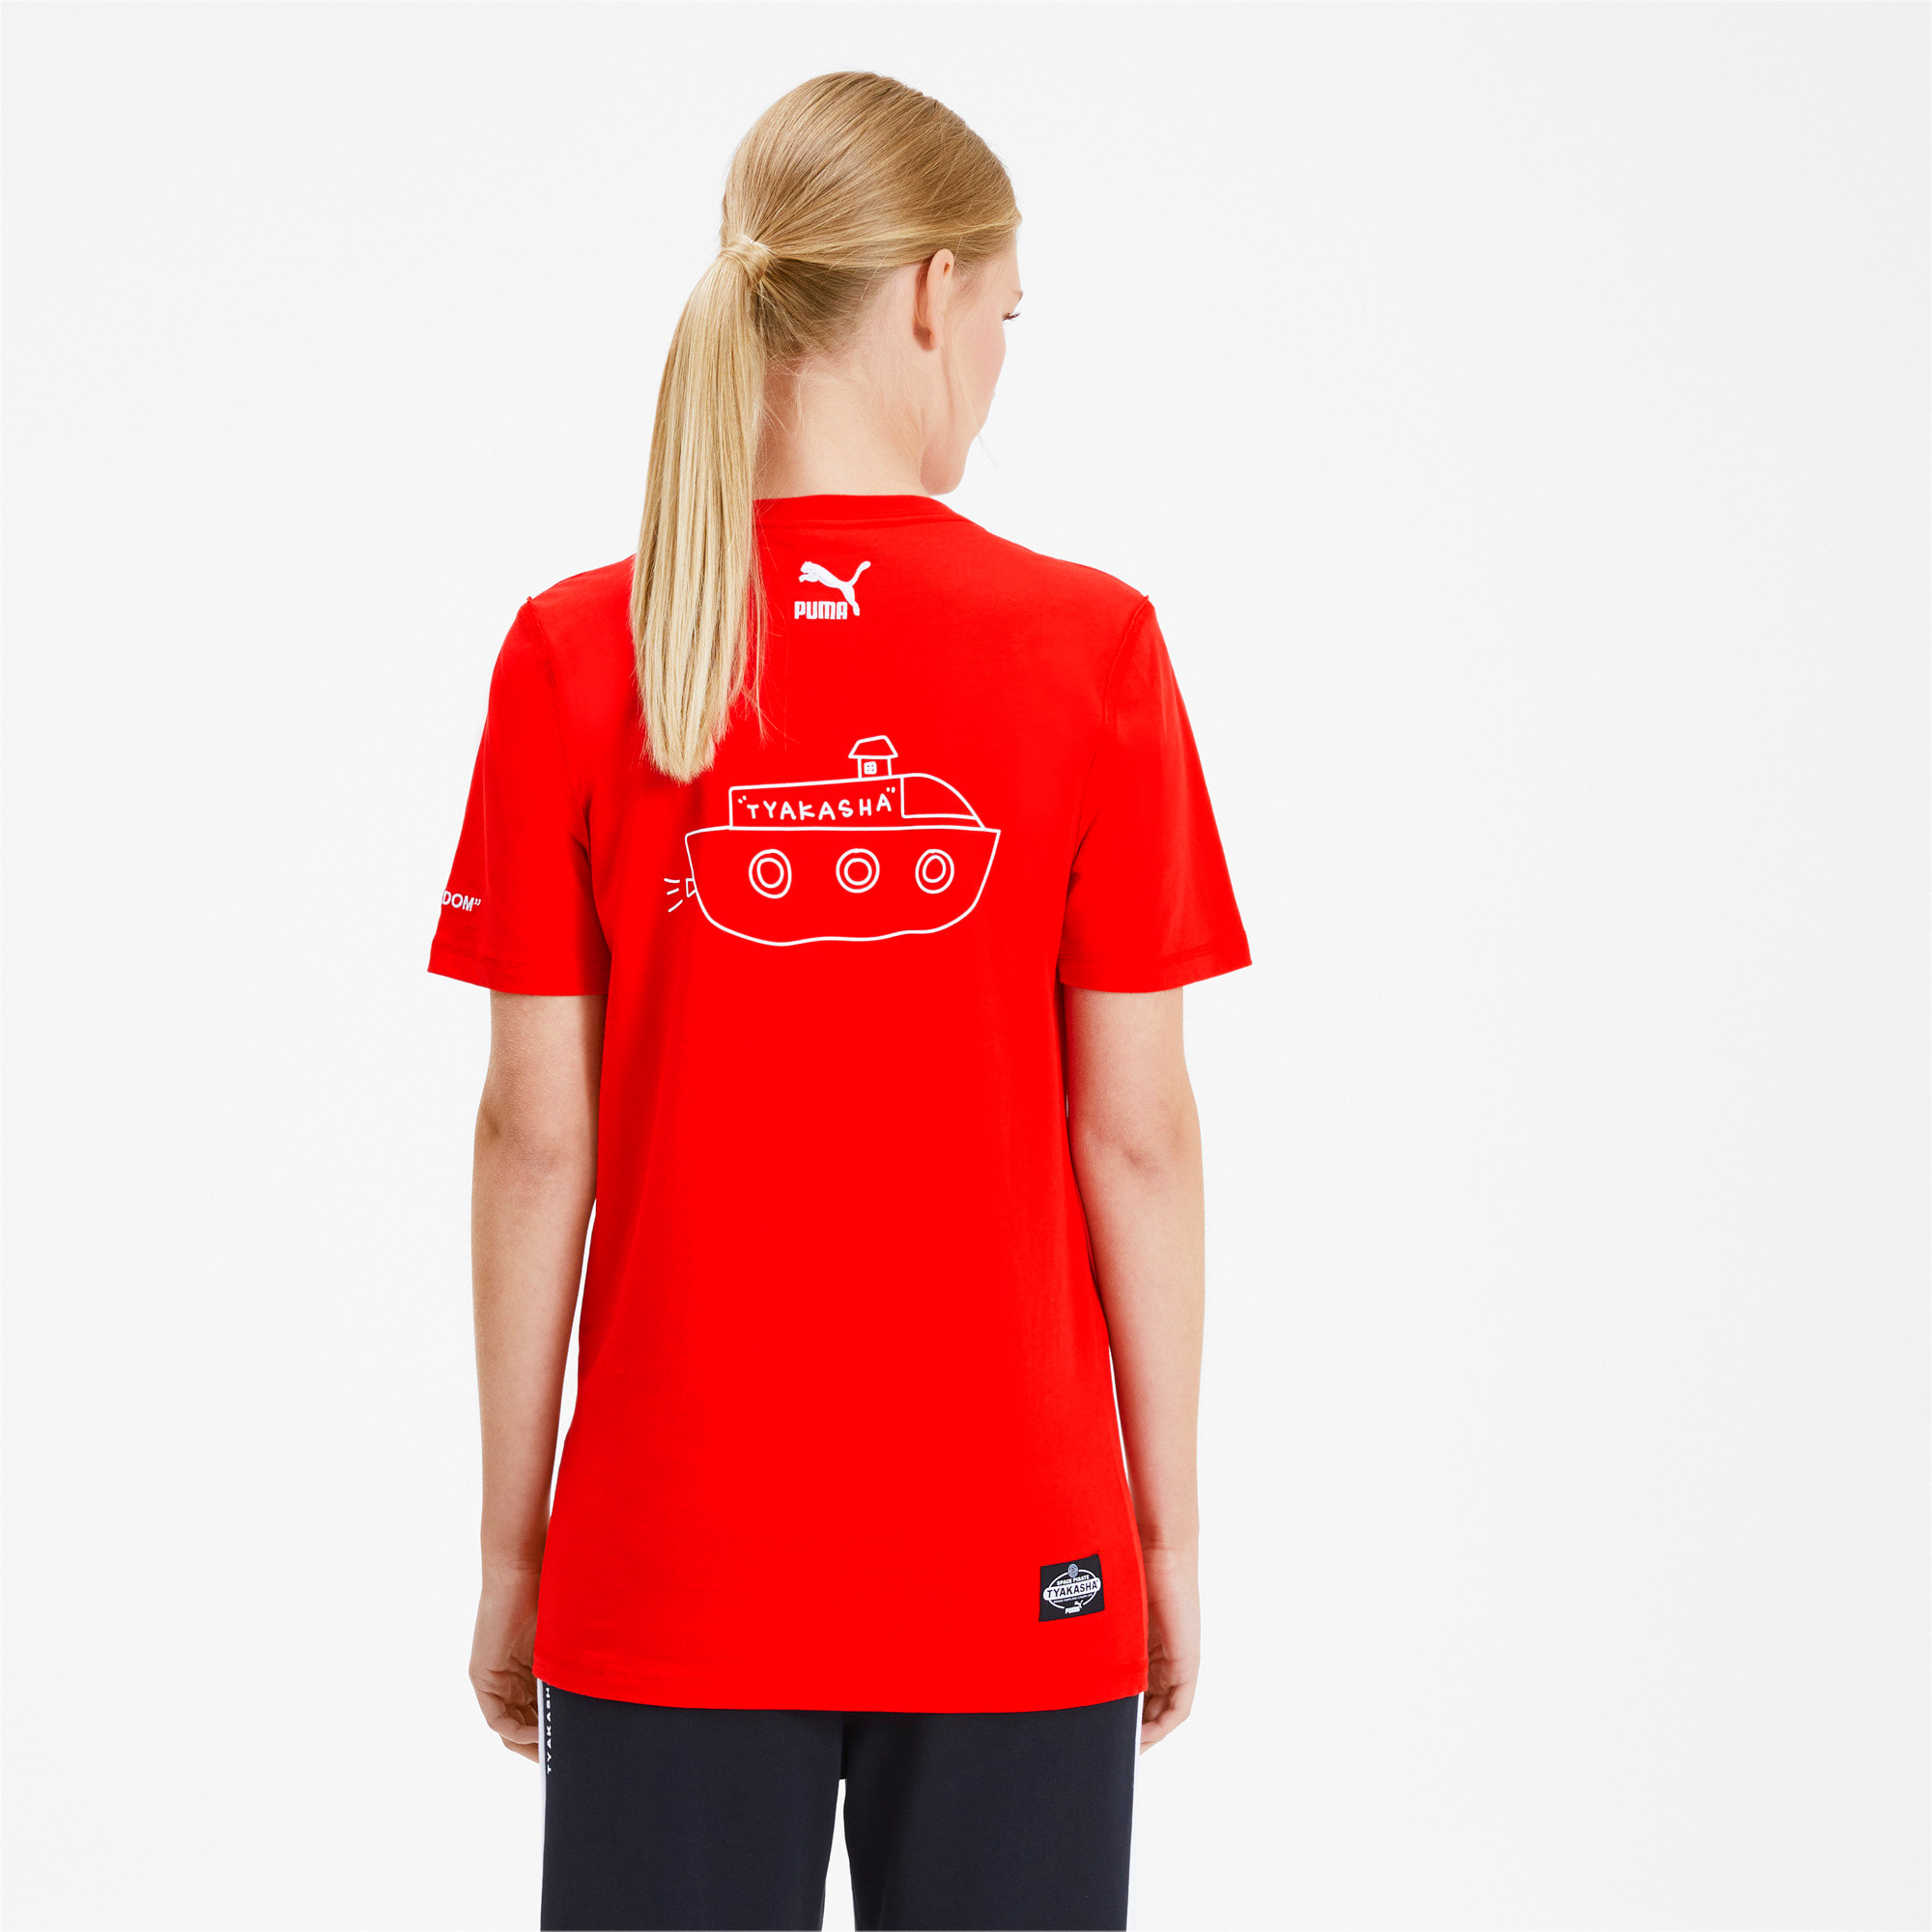 Thumbnail 3 of PUMA x TYAKASHA T-Shirt, High Risk Red, medium